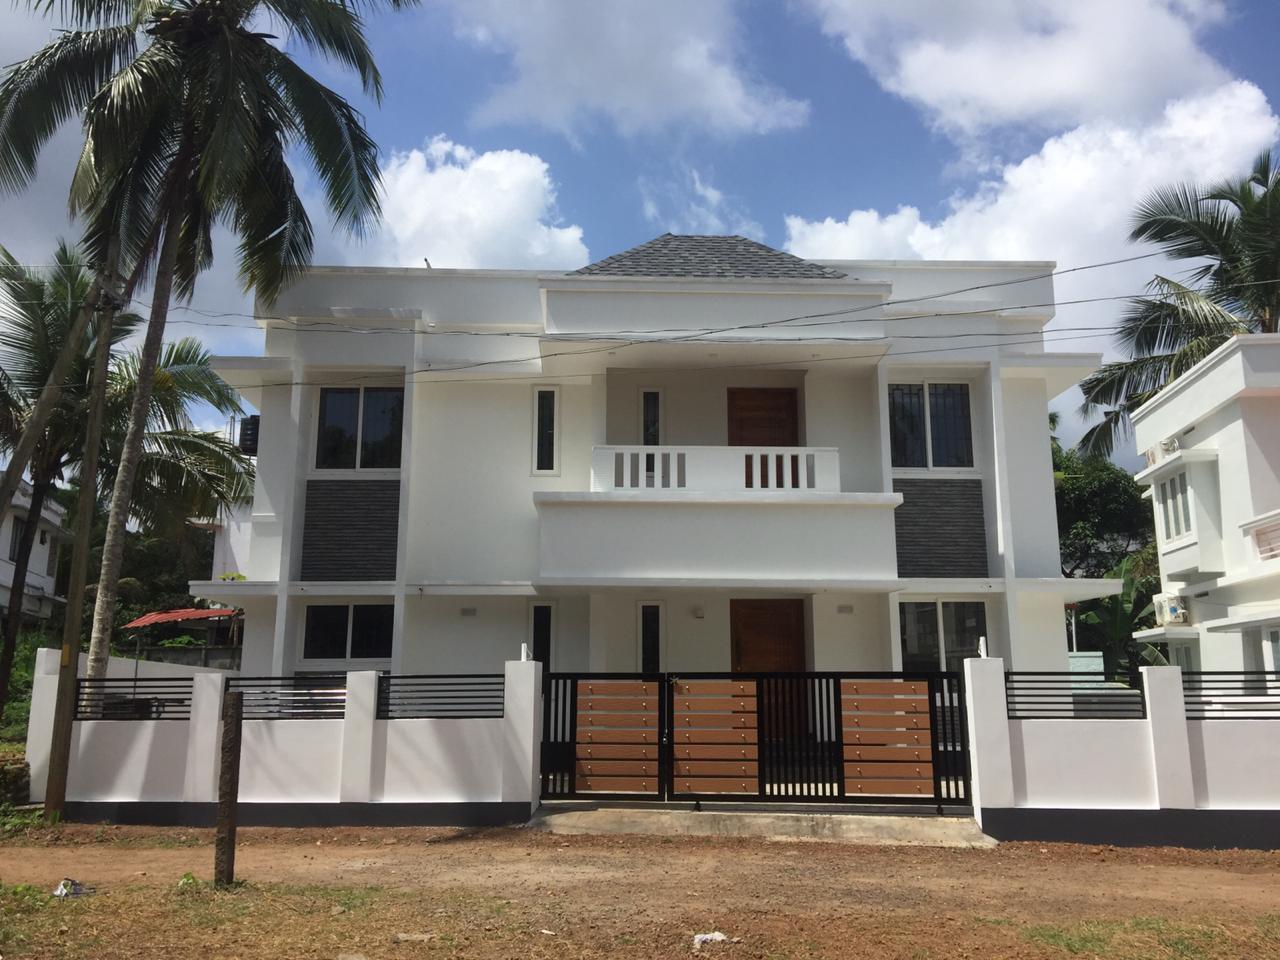 2000sq .Ft. Residential villa for sale in Attore, Kuttur, Thrissur